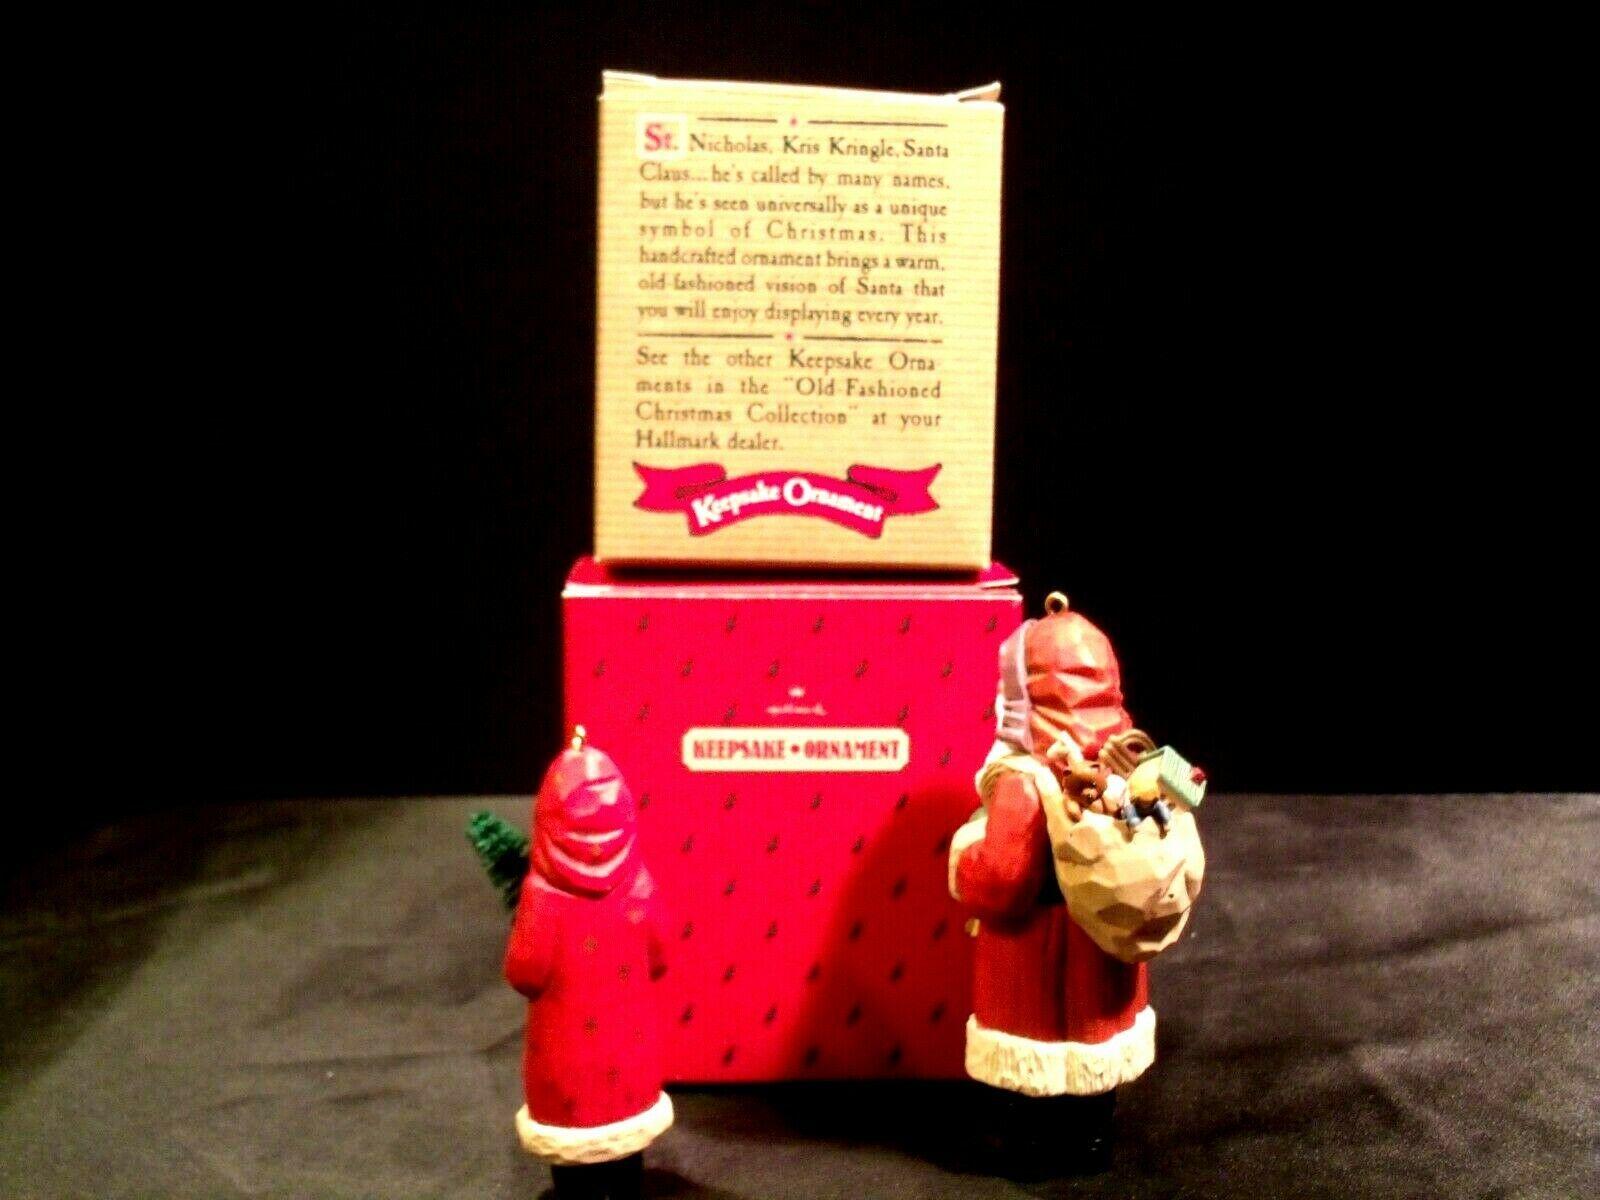 Hallmark Handcrafted Ornaments Old Fashioned Christmas Santa Ornament AA-191783 image 3